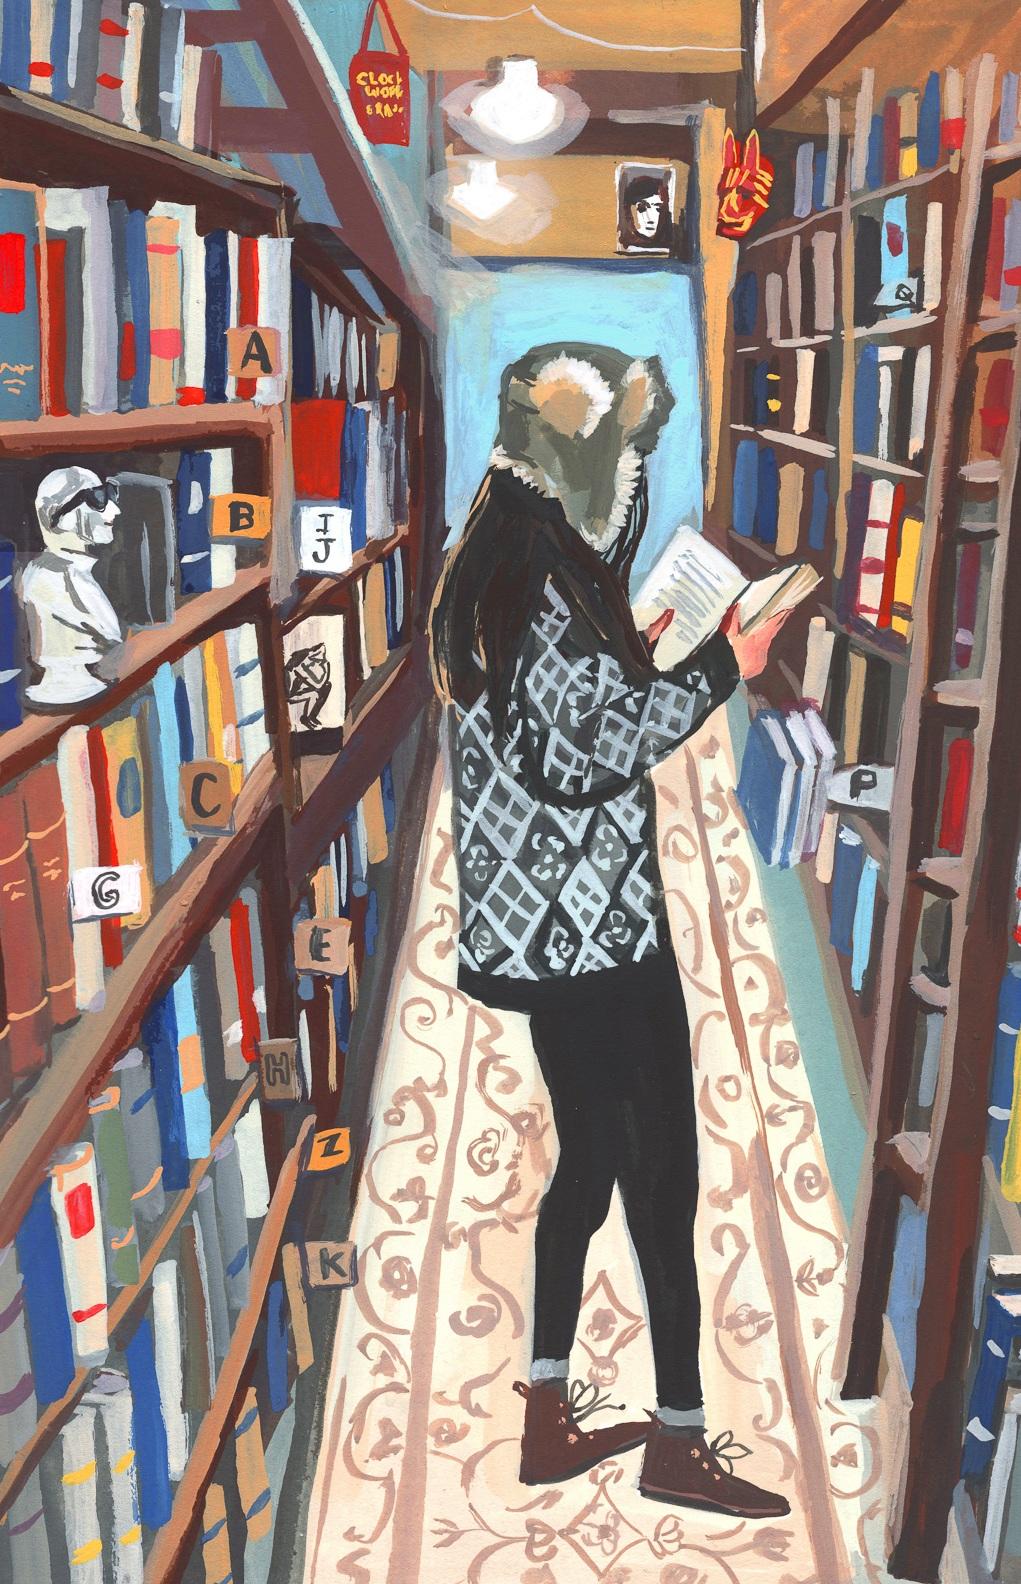 CA 60 2019, SOI 61 2018 - ARTIST: Jenny KroikTITLE: Westsider [Series, 6 of 7]